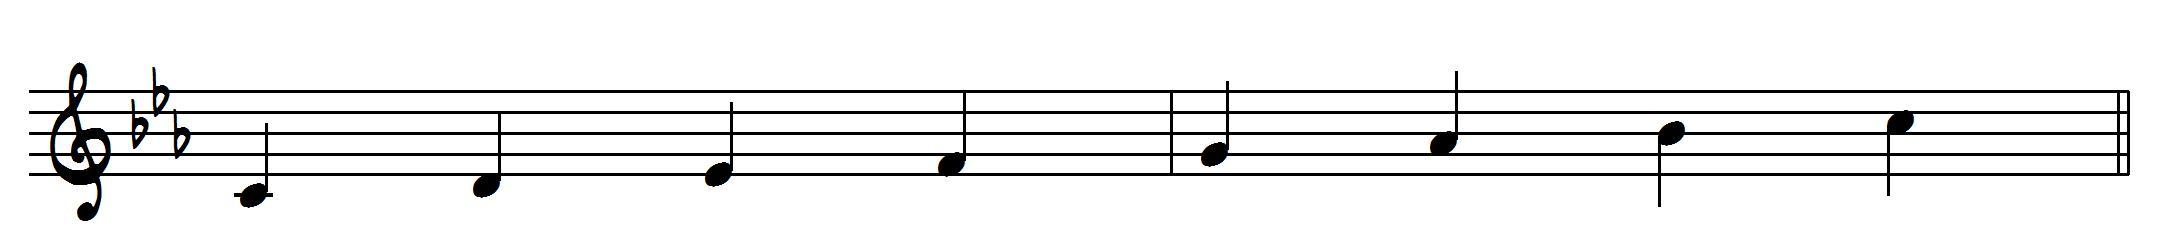 Understanding The Minor ii V I Progression  Chords